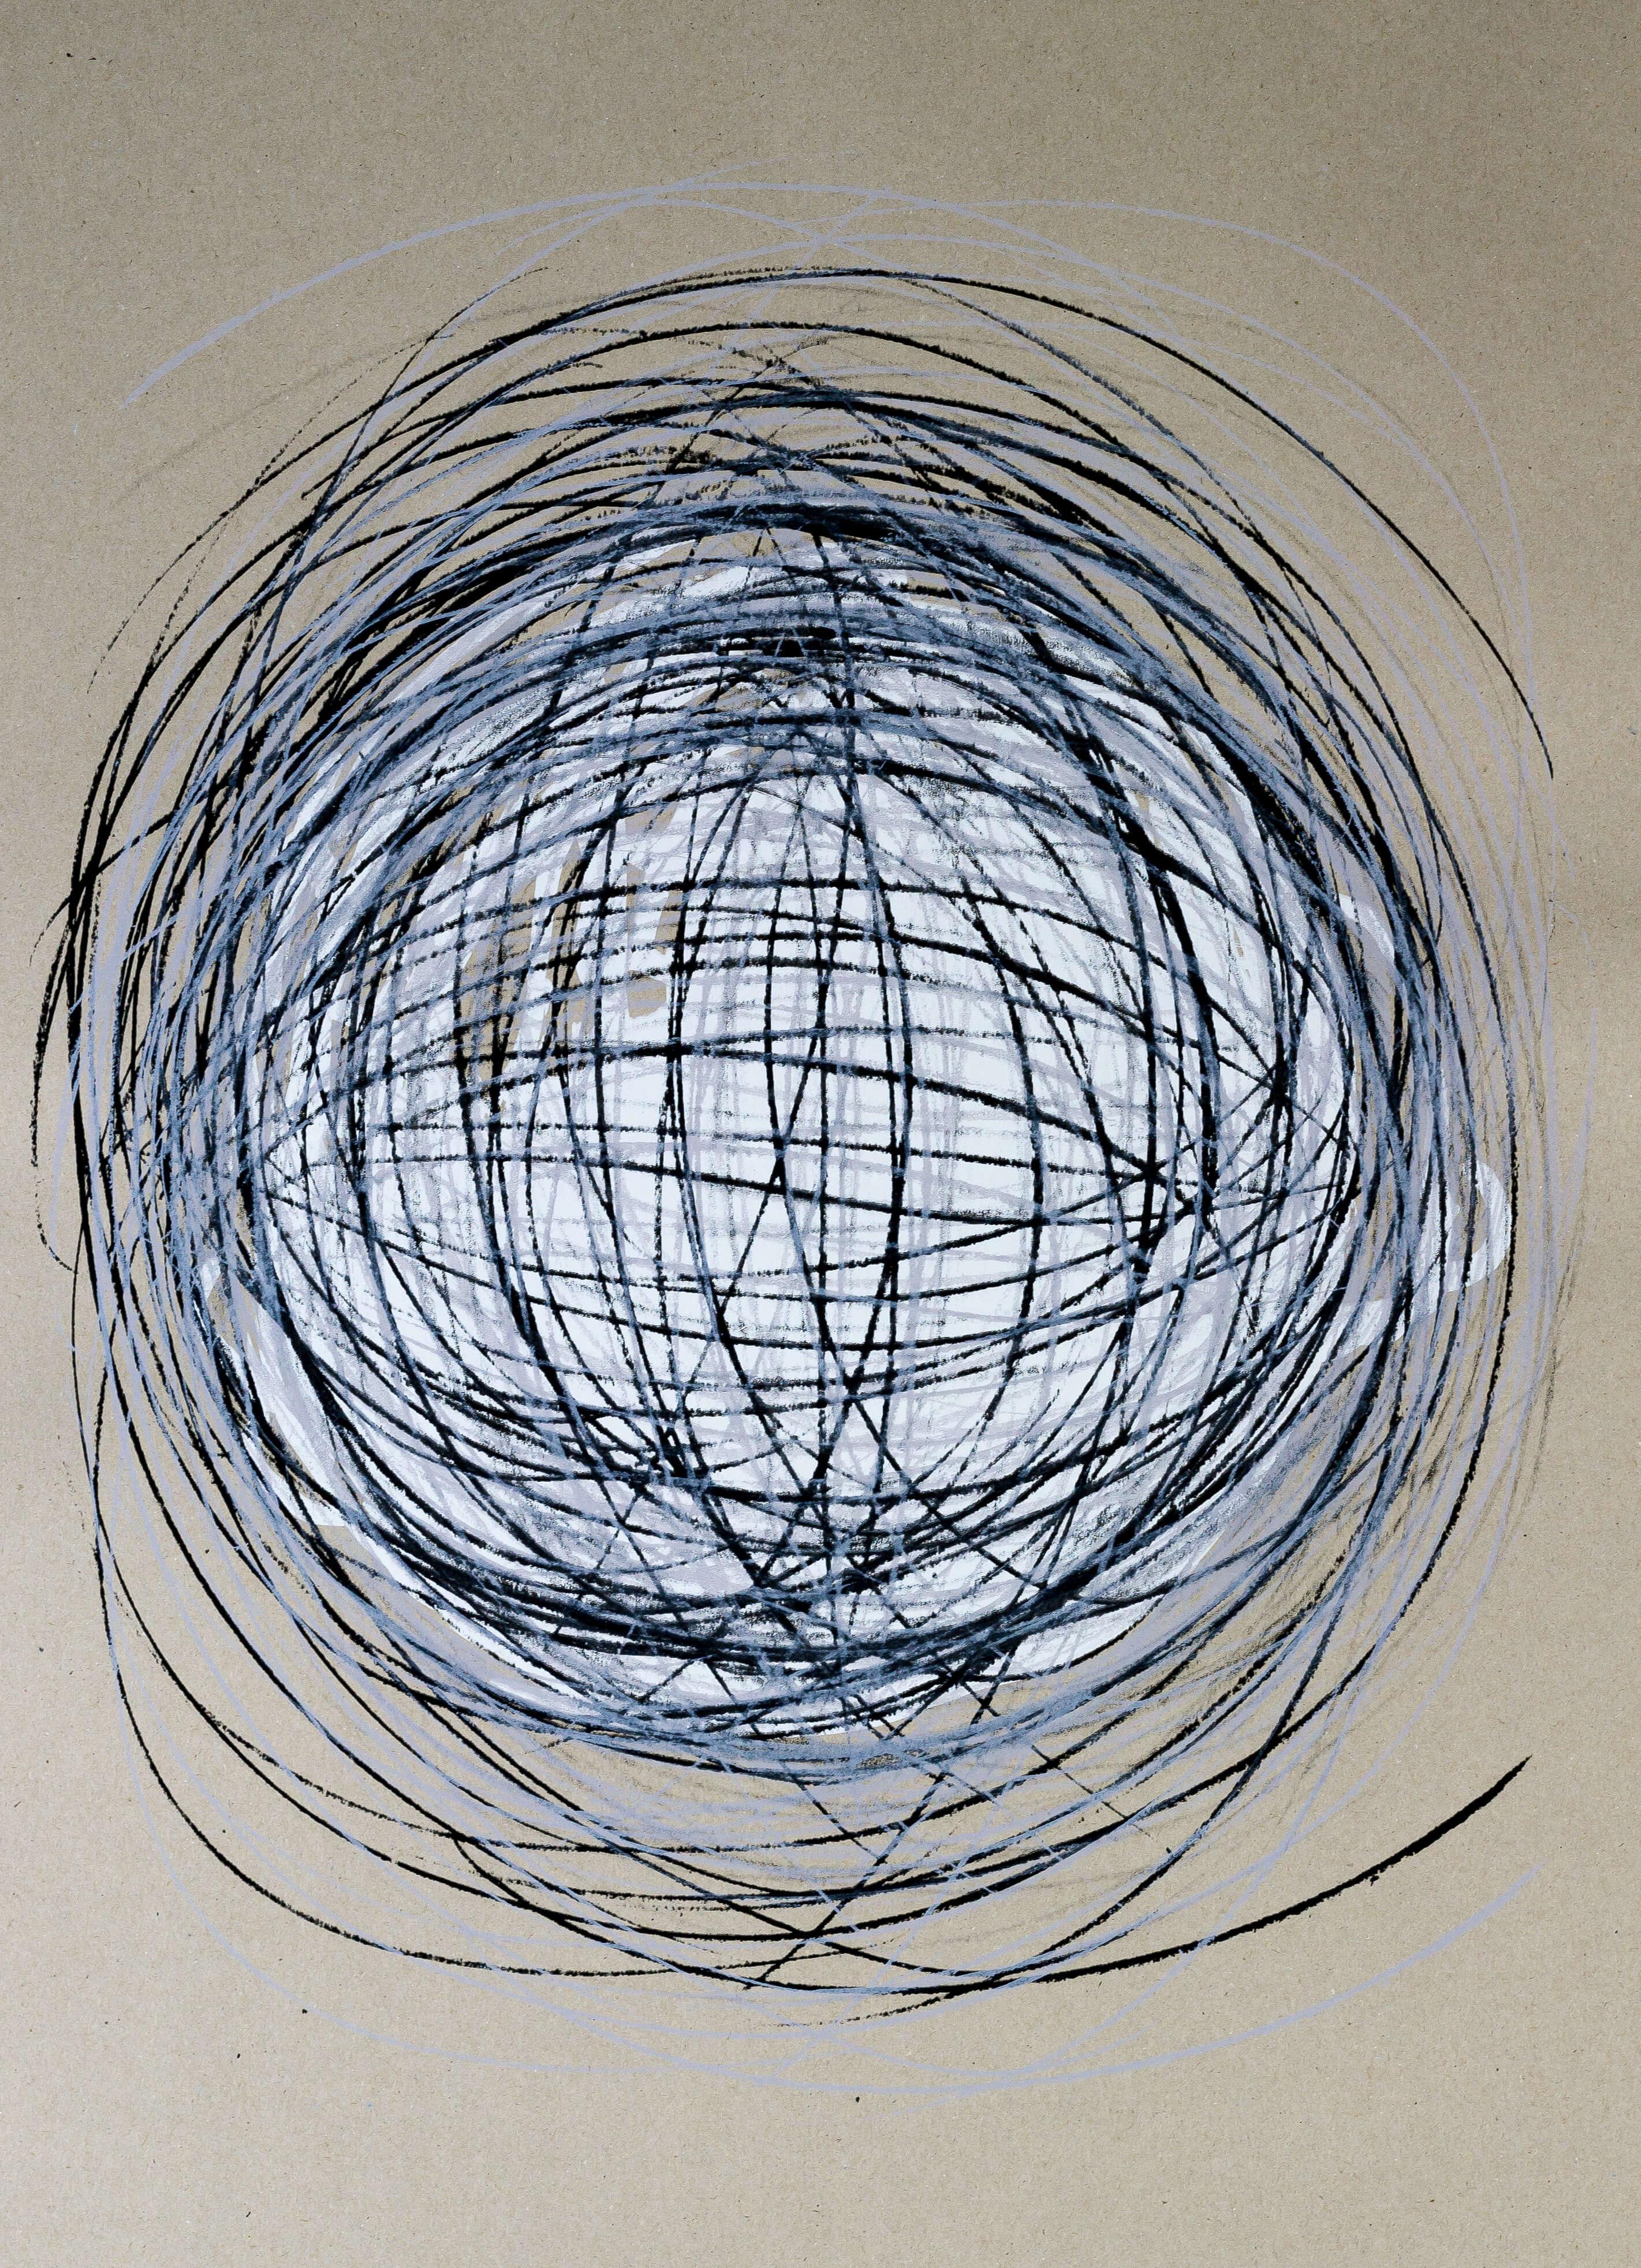 Katharina Albers, Transformation XXX, 2011, Siebdruck, Unikat, 59,5x42cm